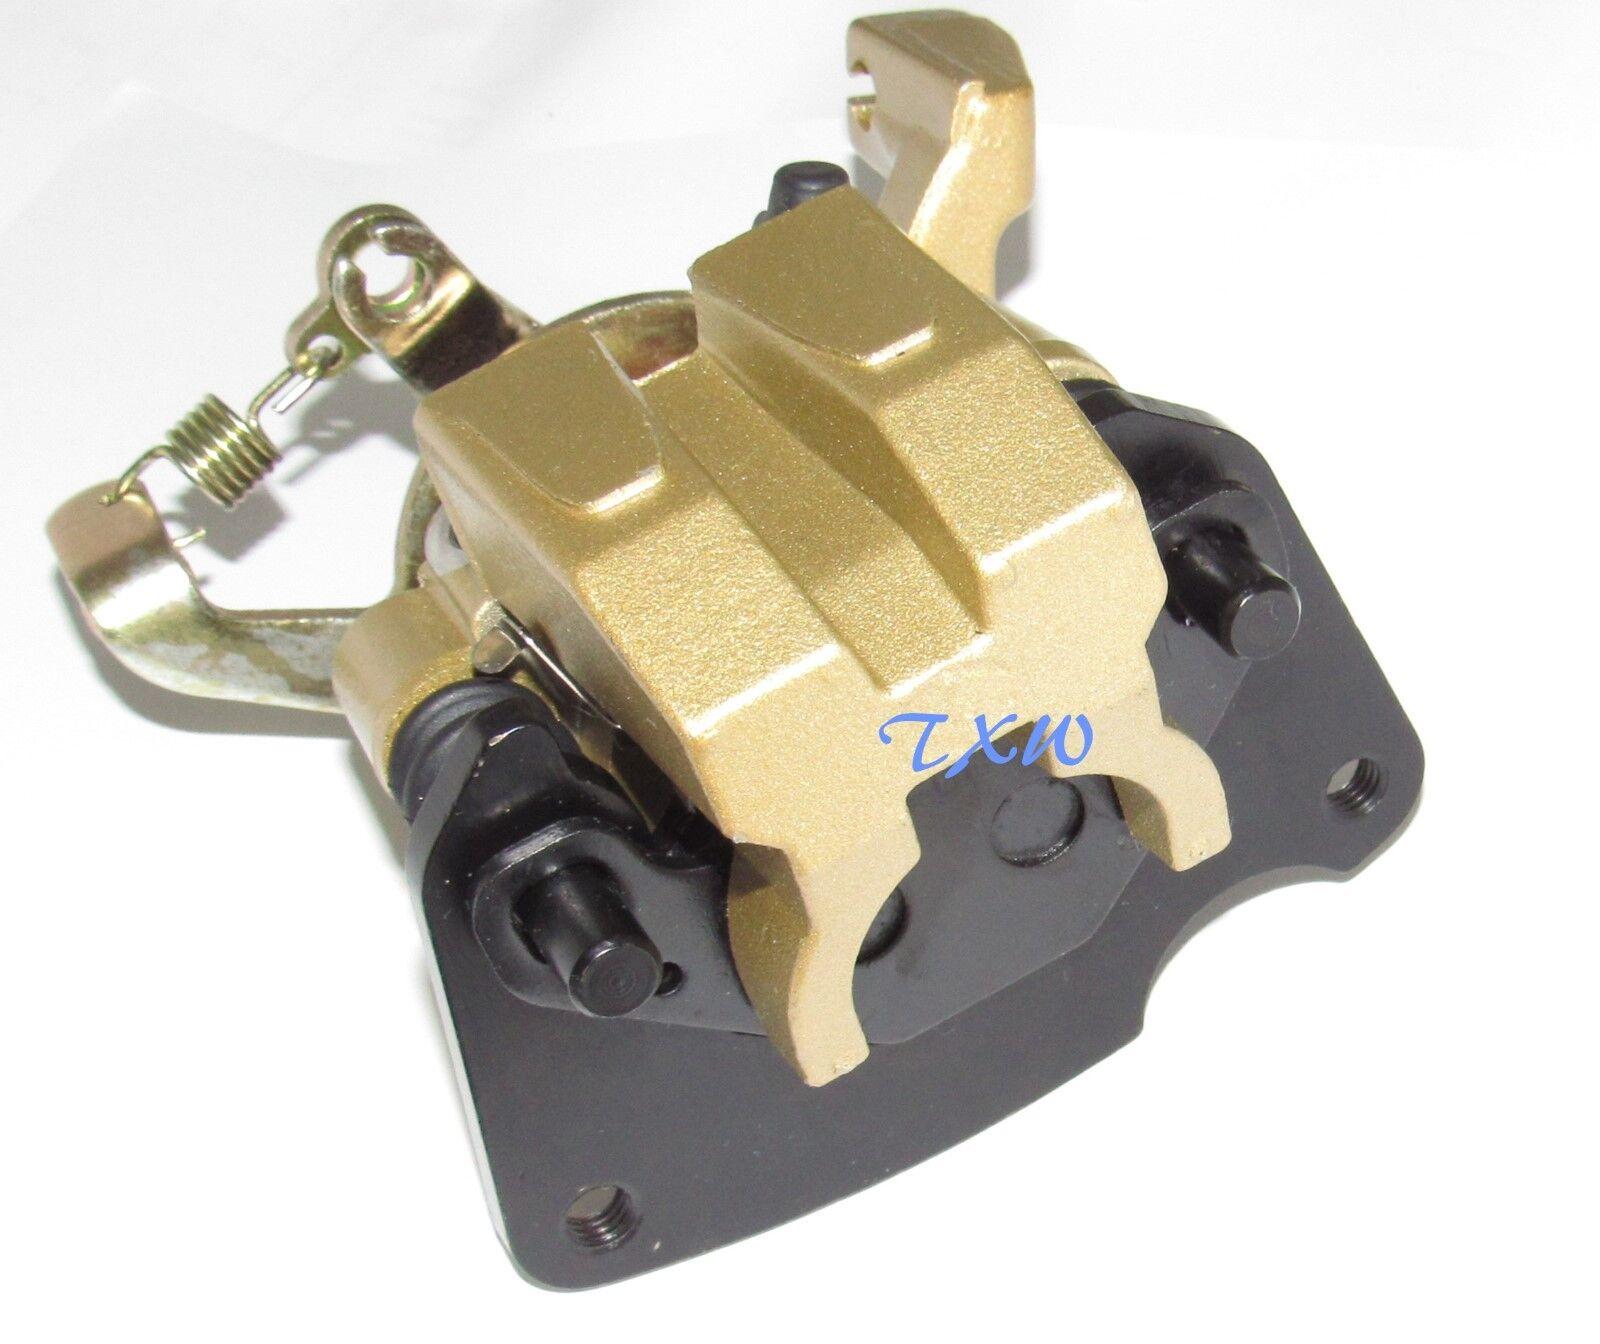 Go kart rear brake caliper for BAJA REACTION BR250 DN250  BR150 BR150S HOWHIT  save on clearance